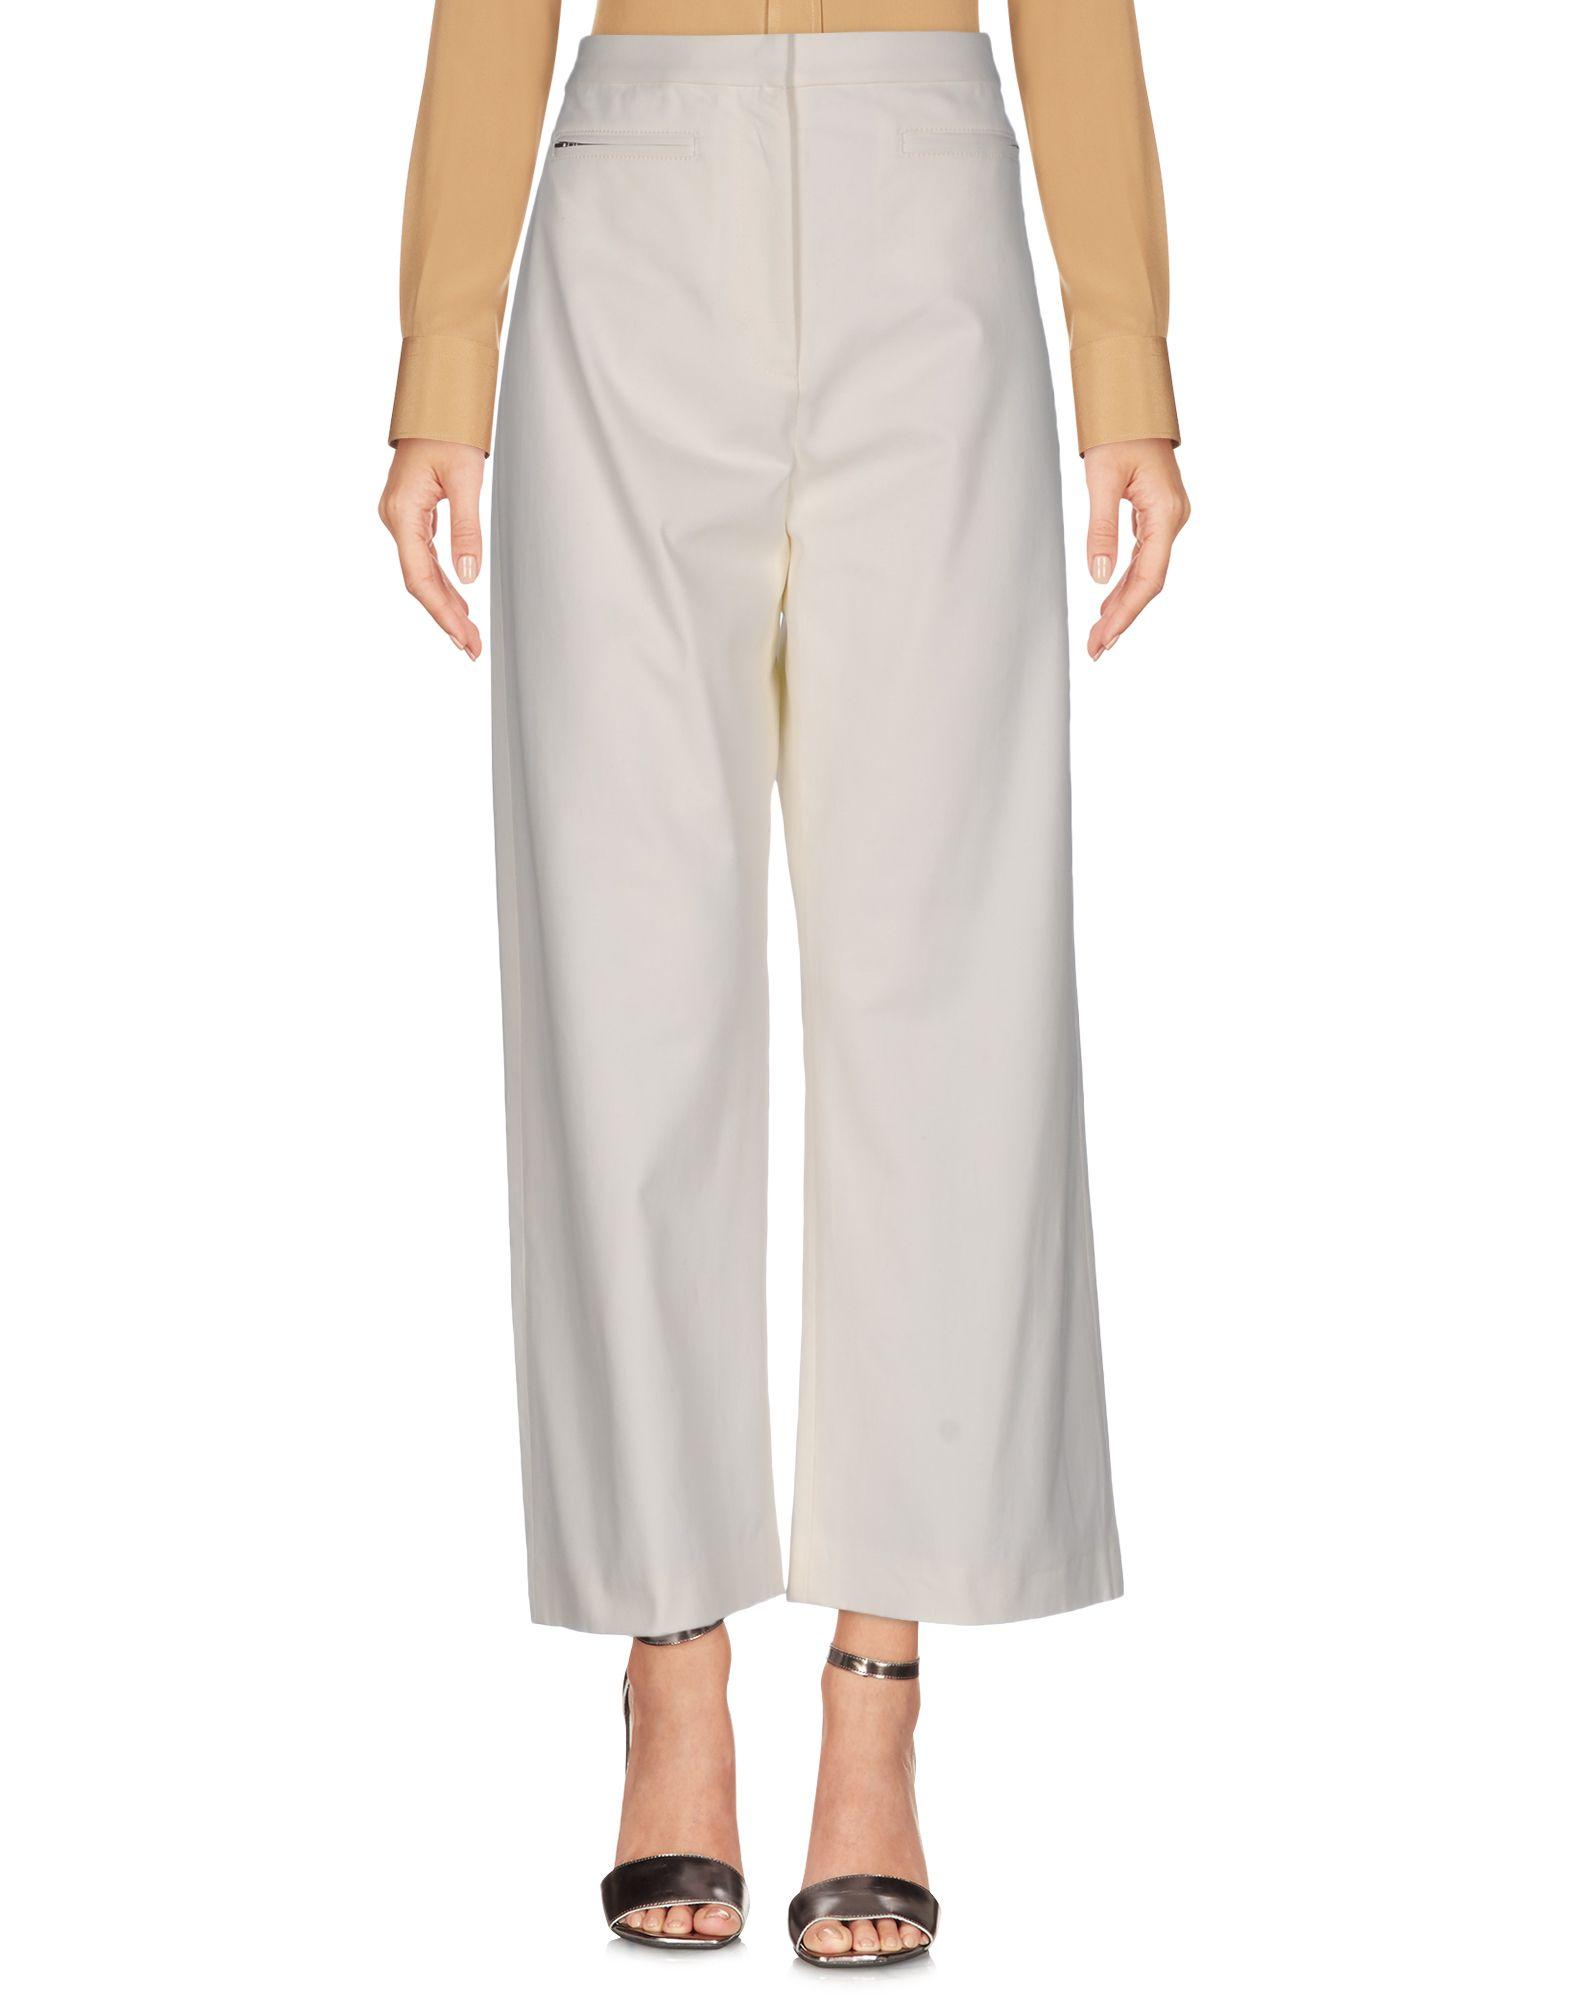 Pantalone Alexander Wang Donna - Acquista online su cO9lJ6fFZ